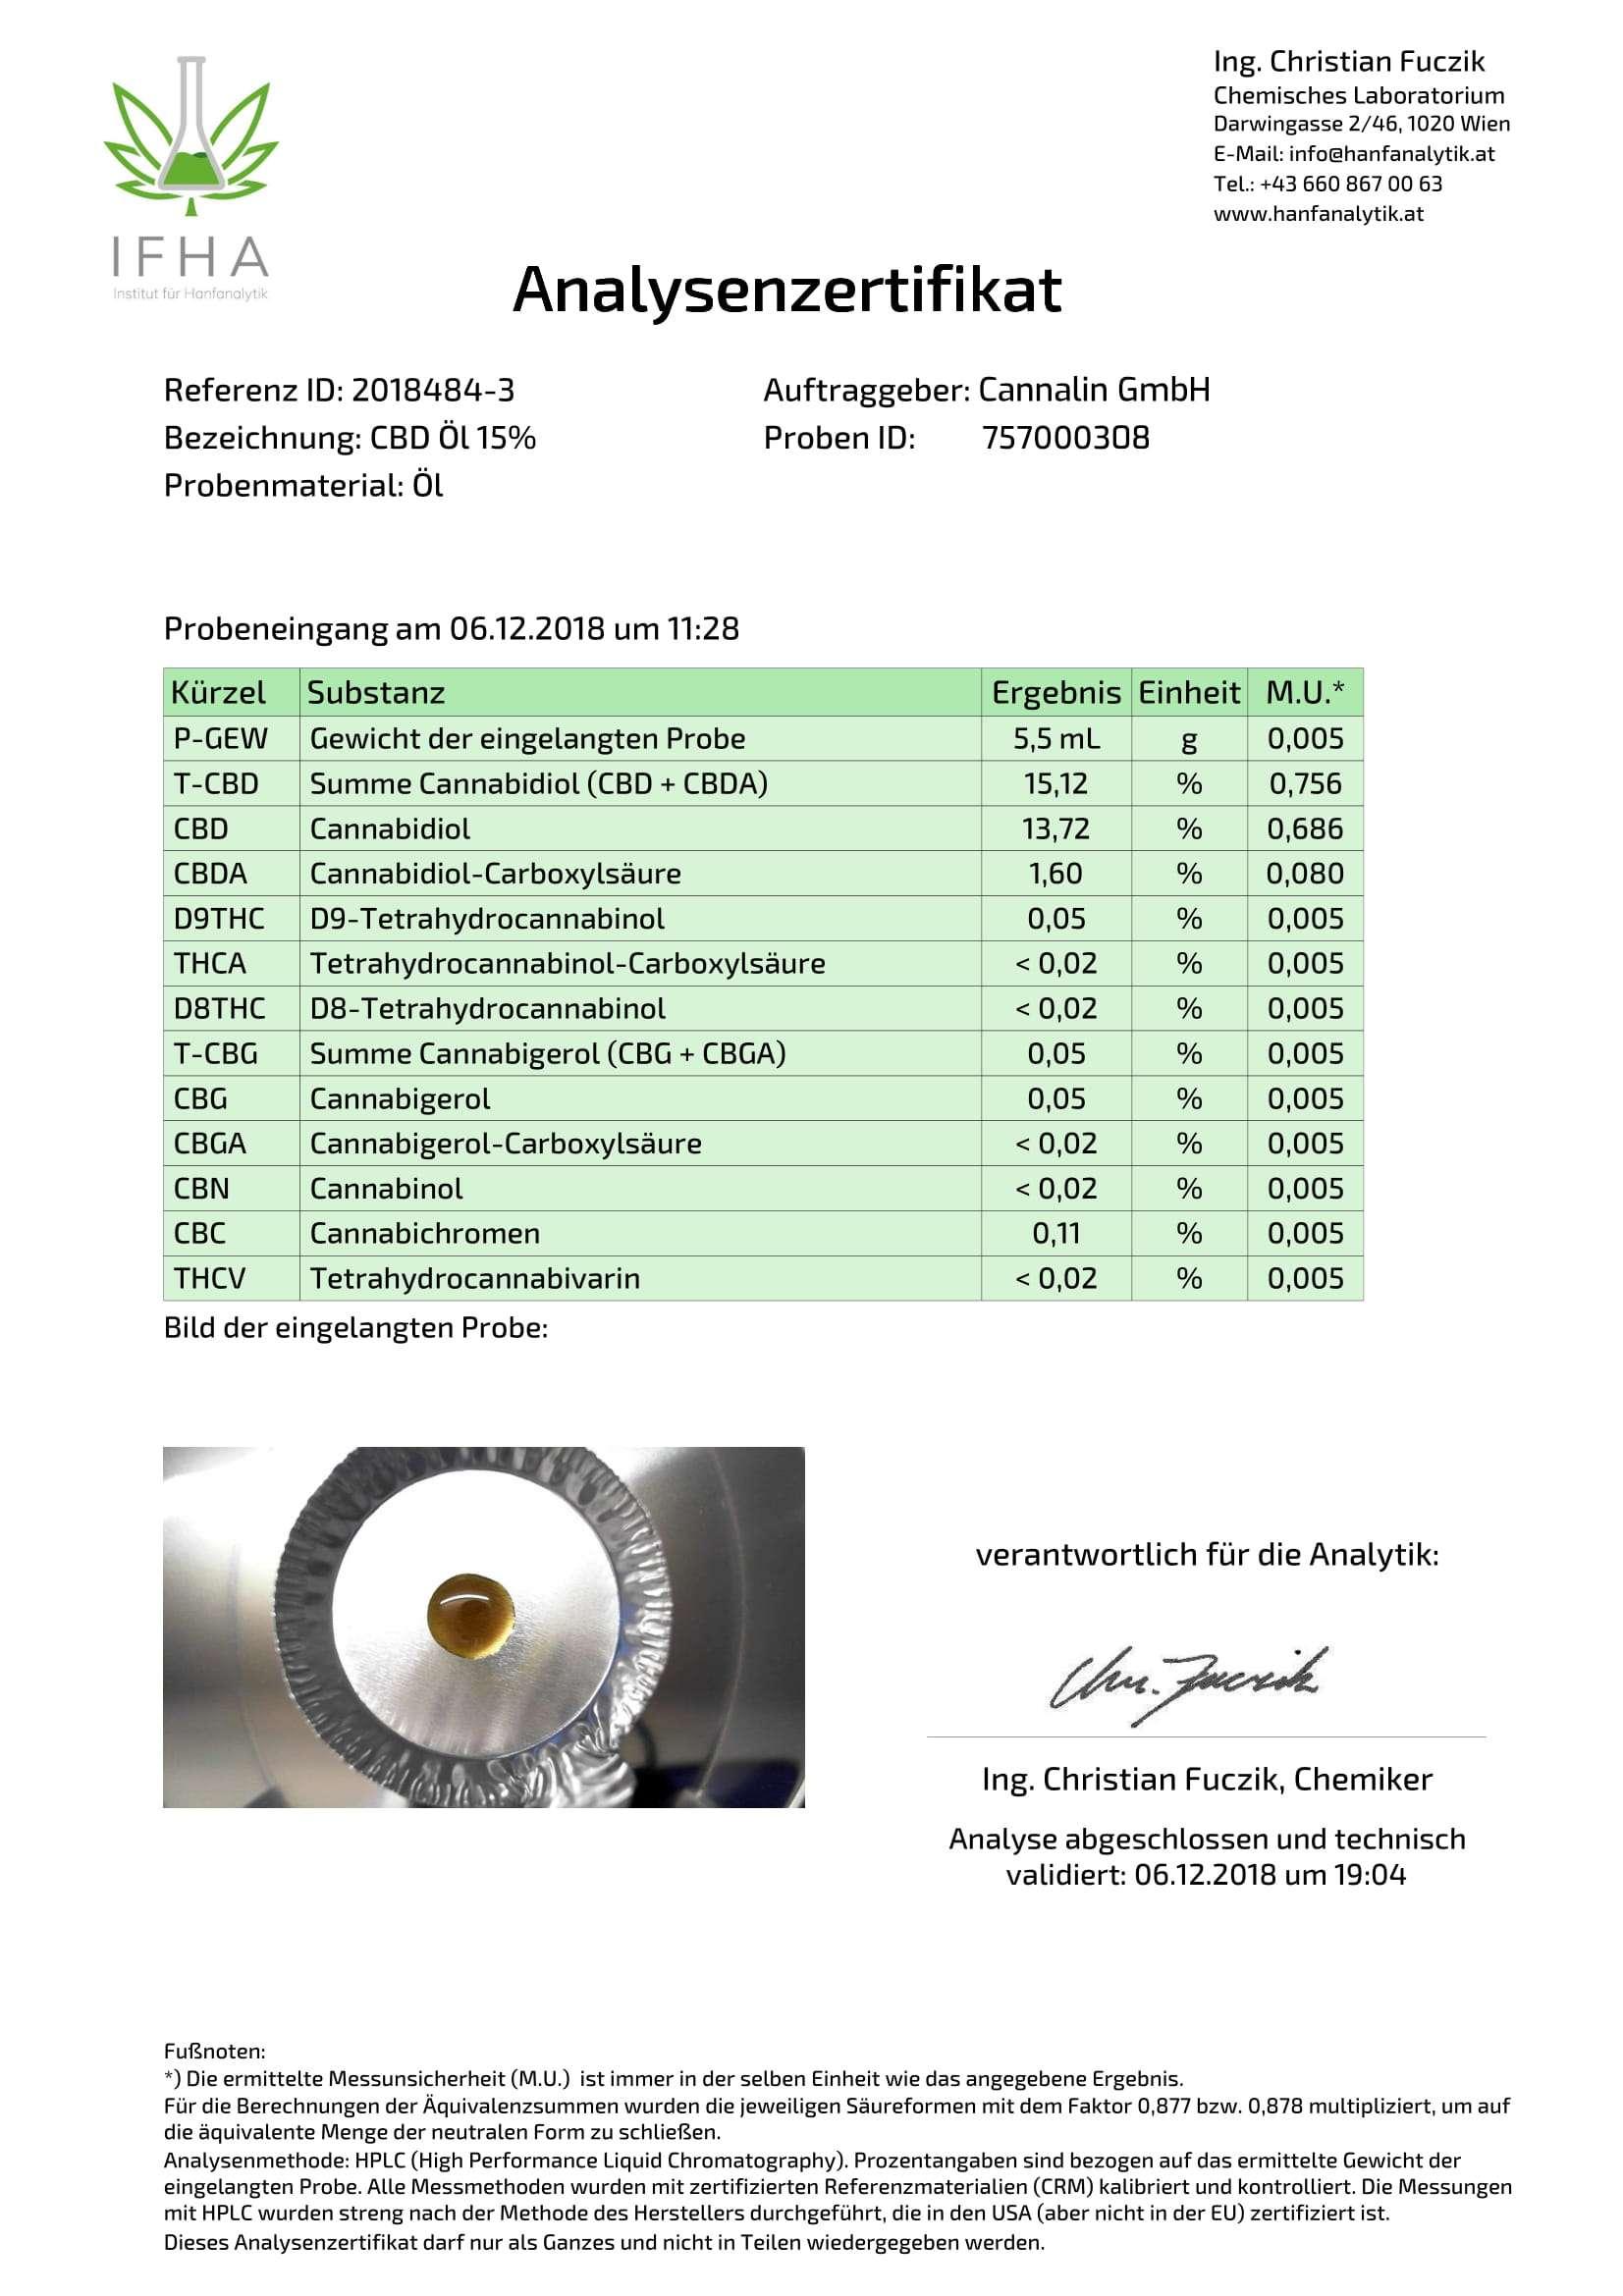 CBD Öl 15% Analysenzertifikat